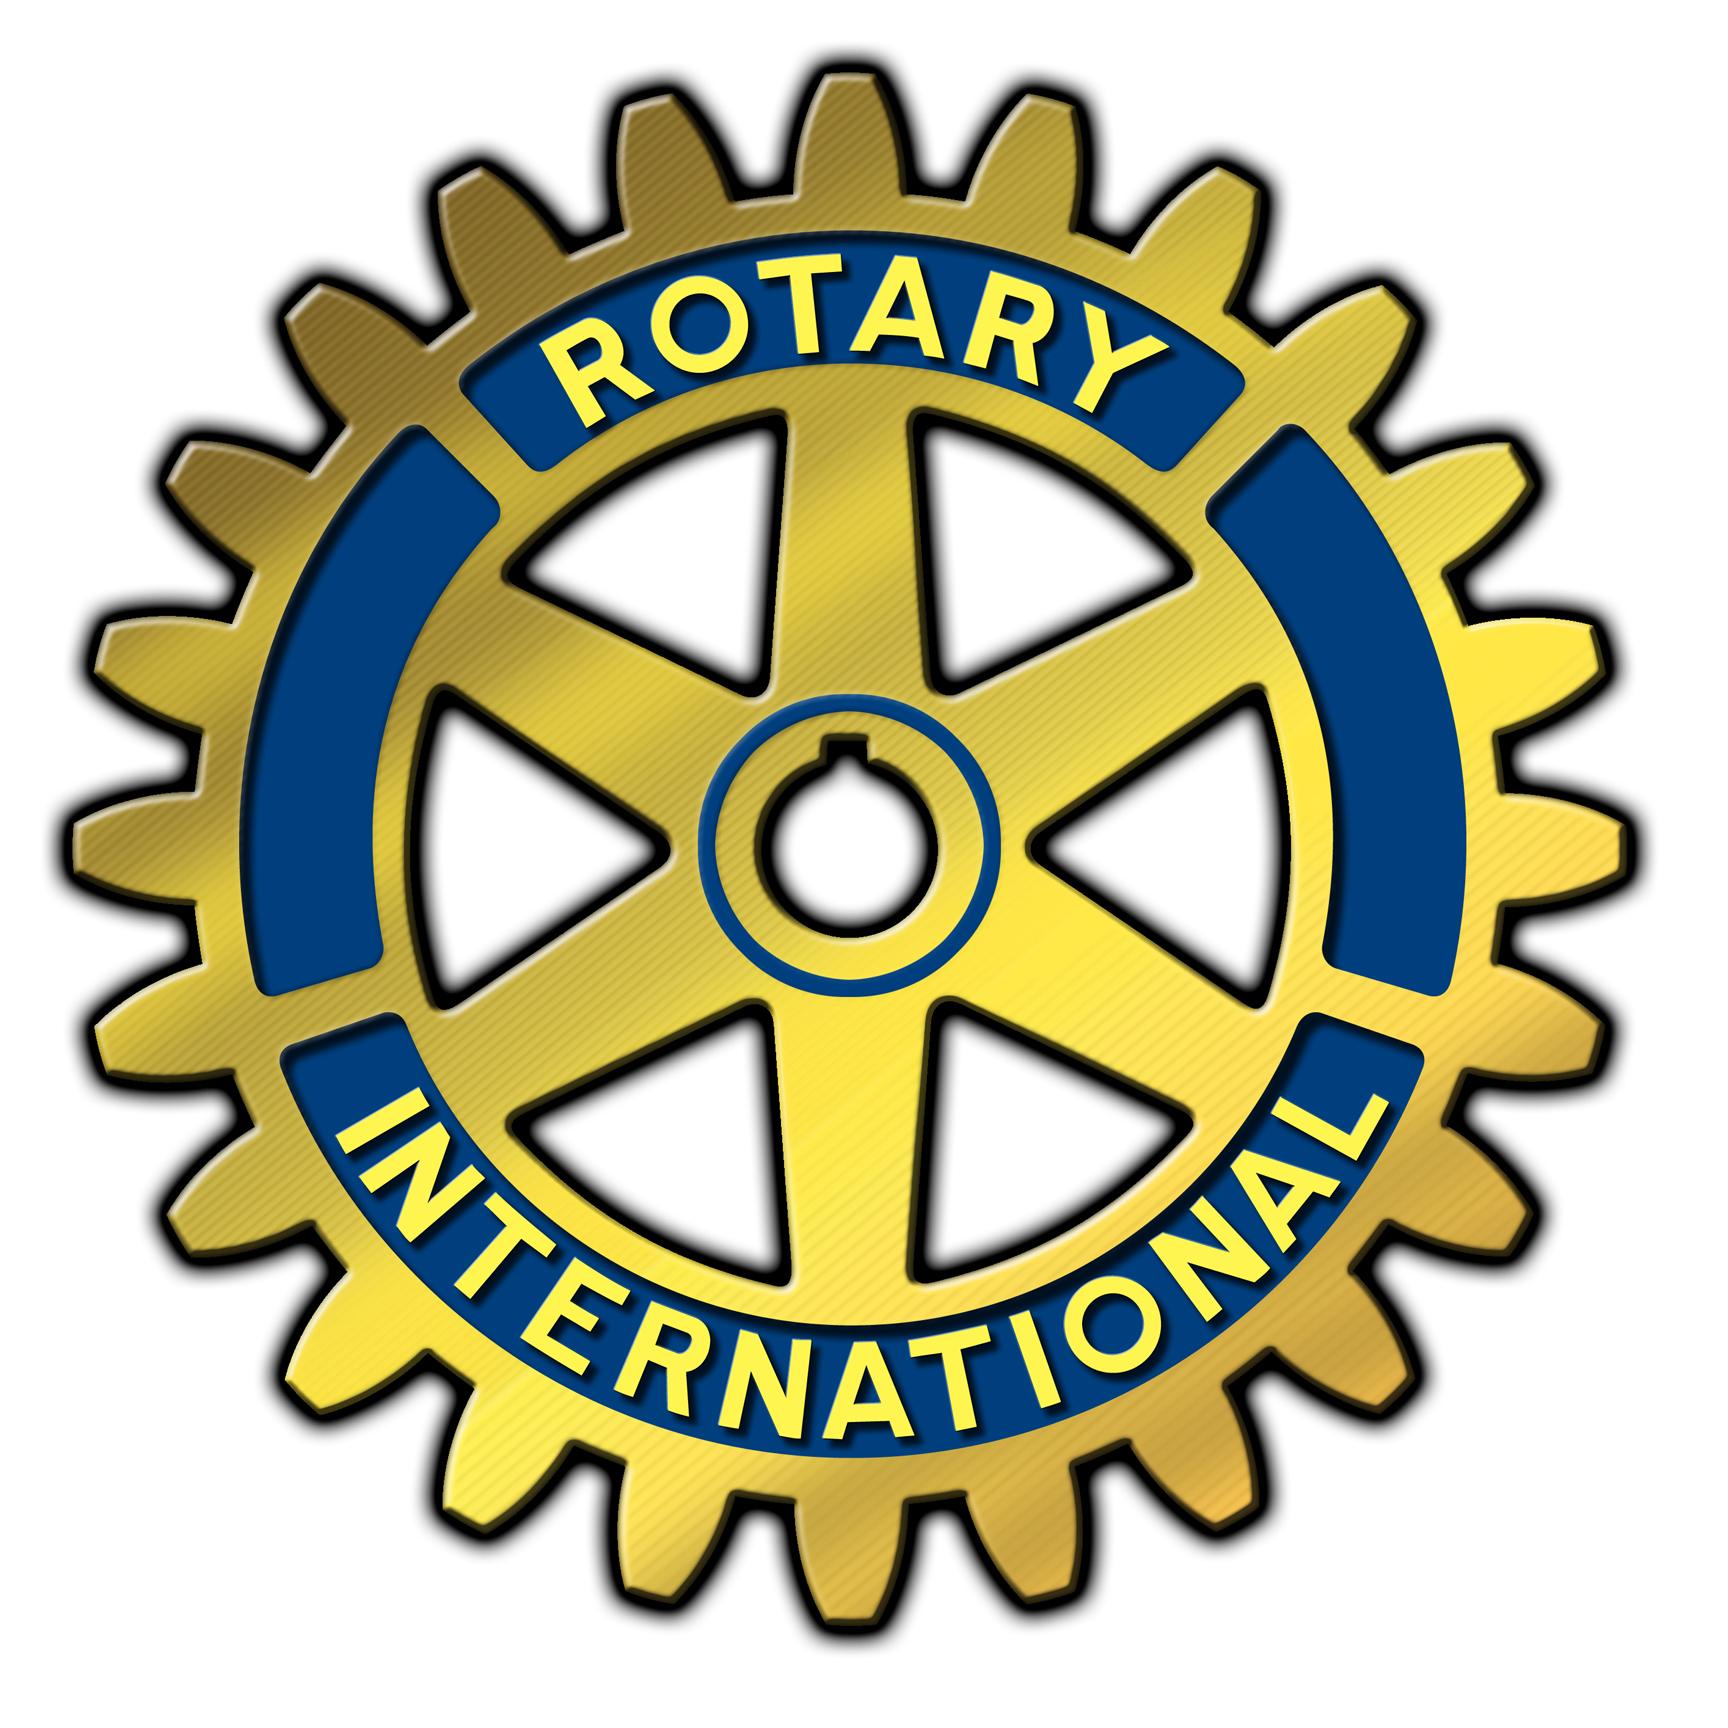 Rotary International Logo, Mindful Community Participation